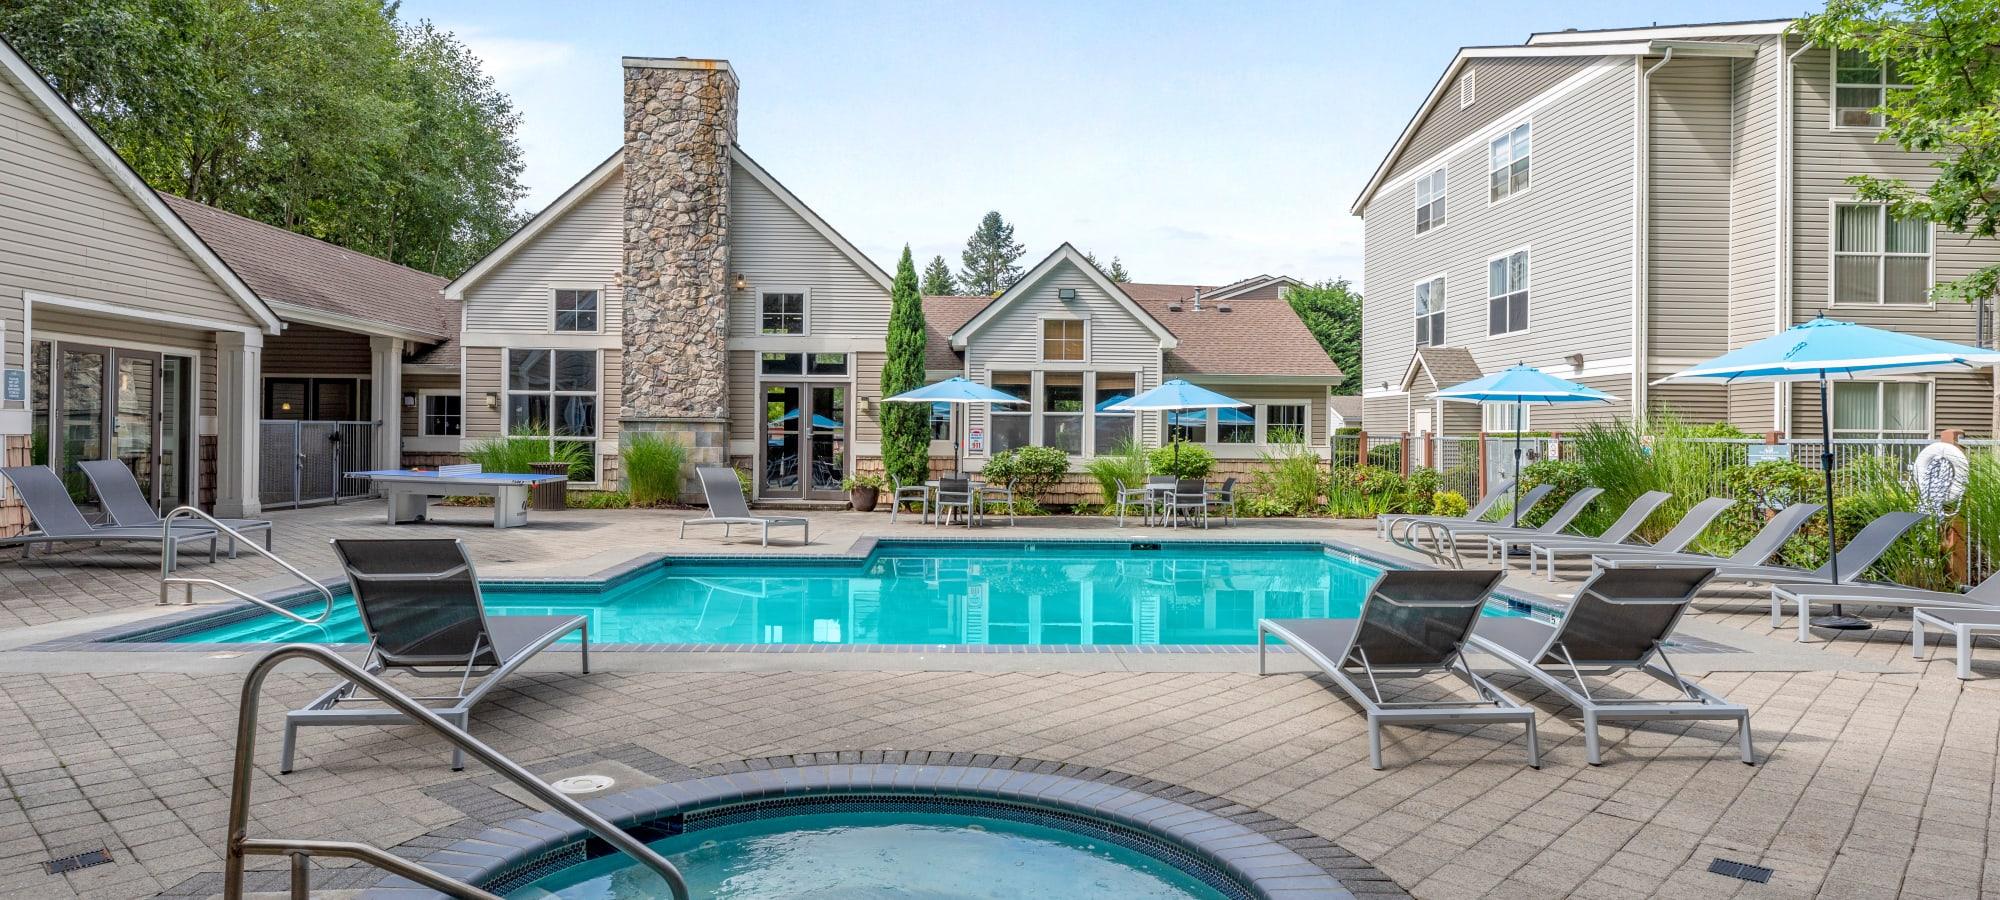 Wildreed Apartments in Everett, Washington